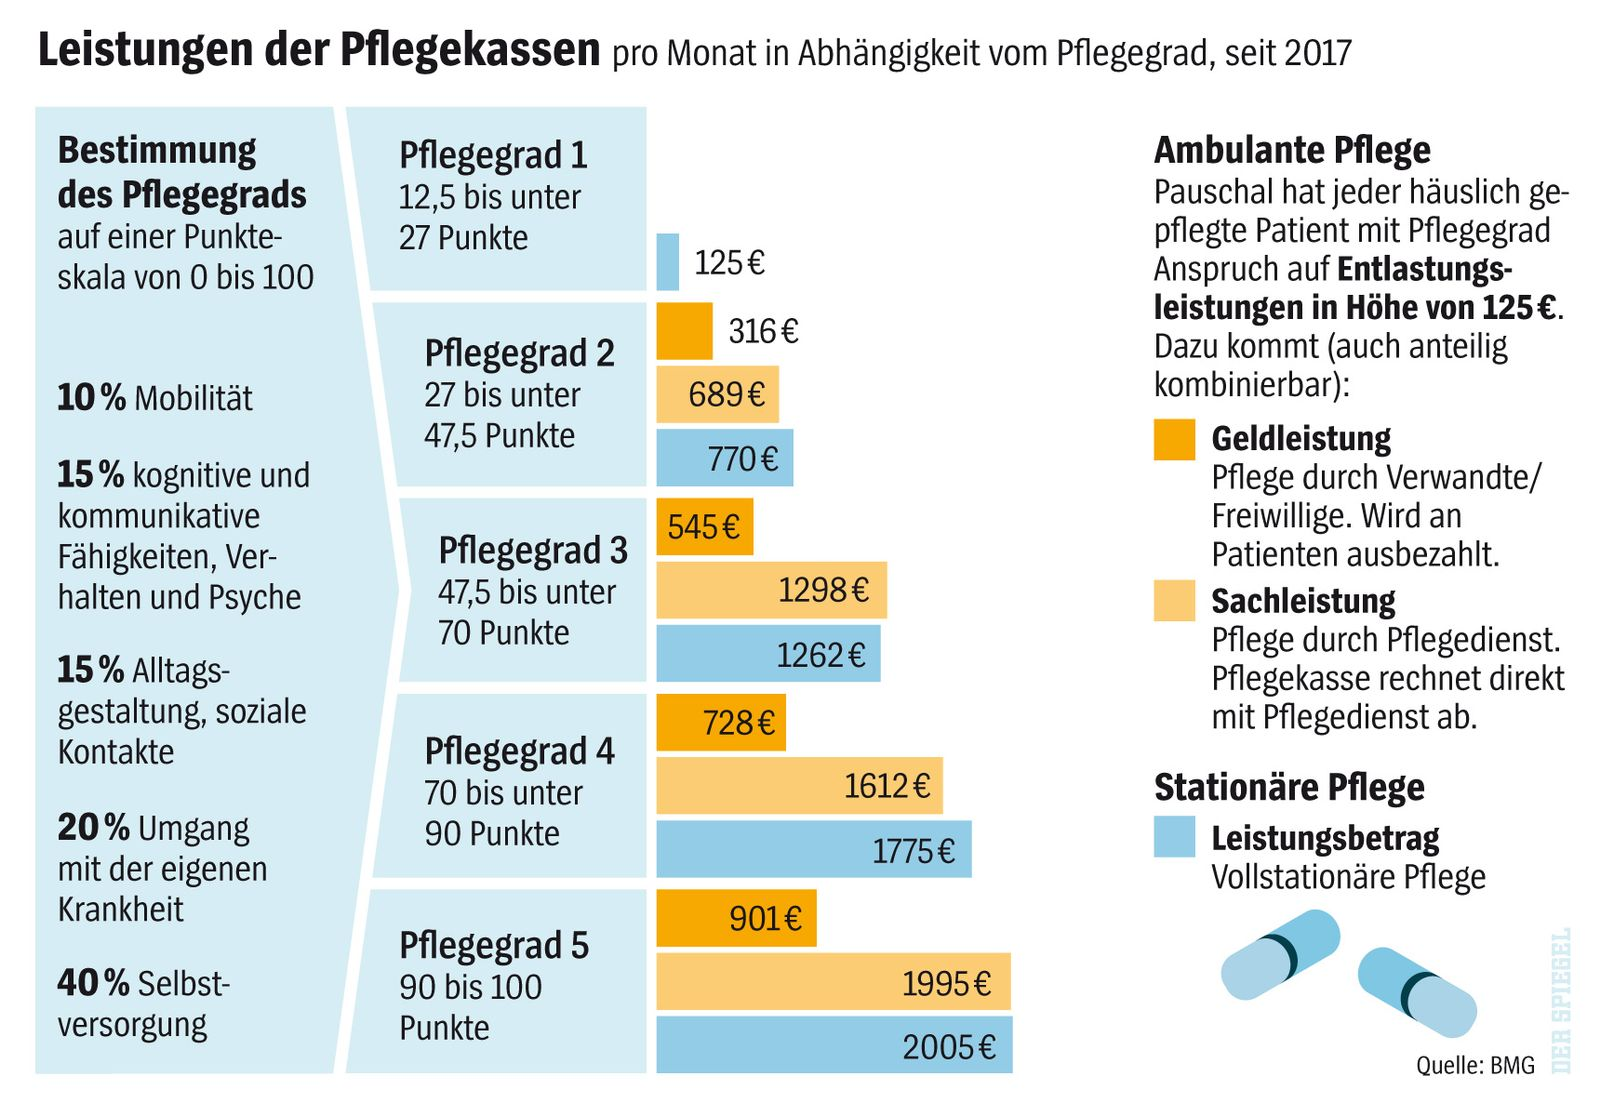 SPIEGEL Plus SP 2018/5 S.50: TITEL Pflege 2